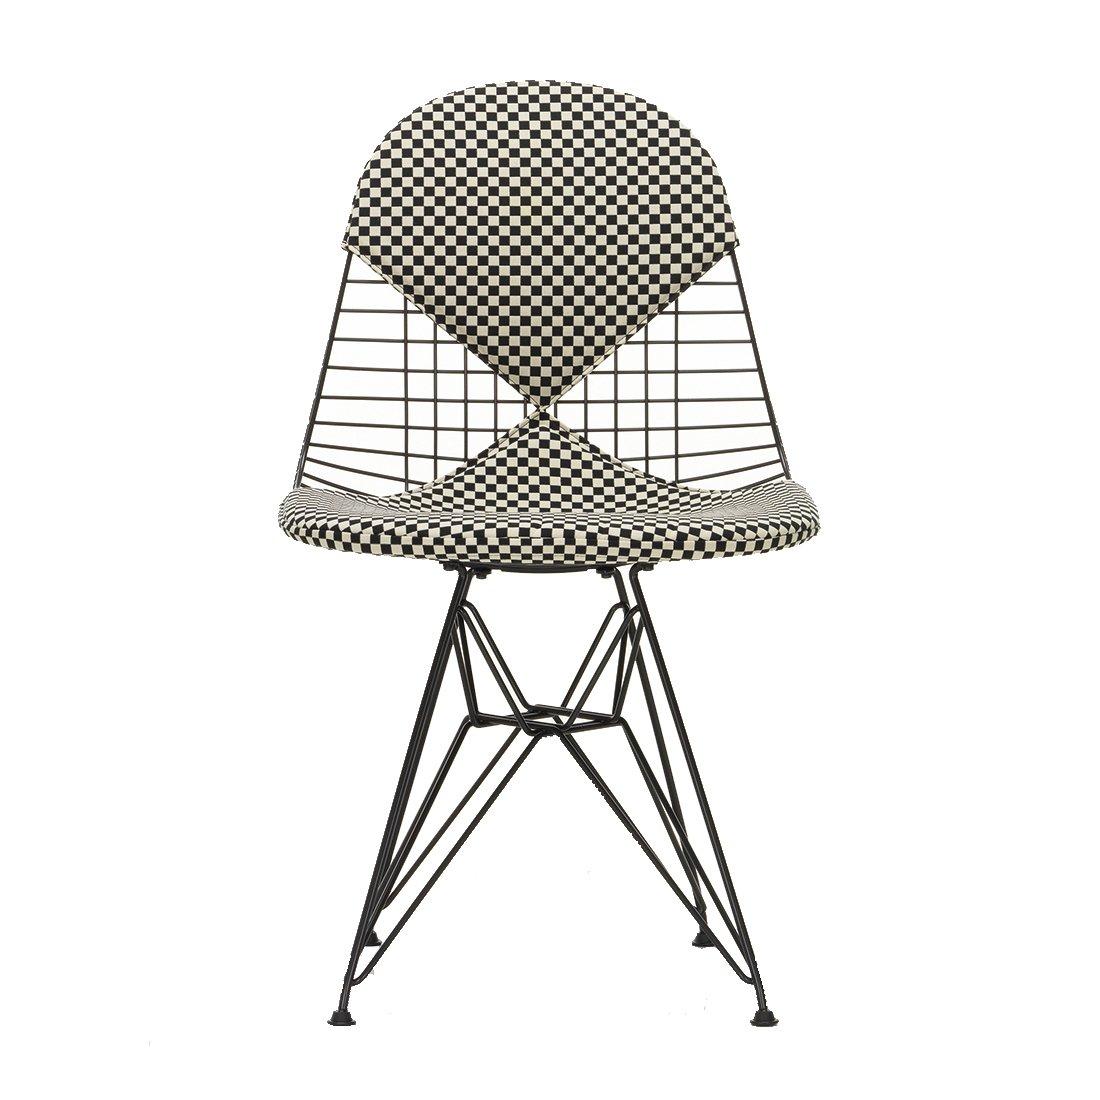 Vitra Wire Chair DKR-2 - Basic Dark/Checkers